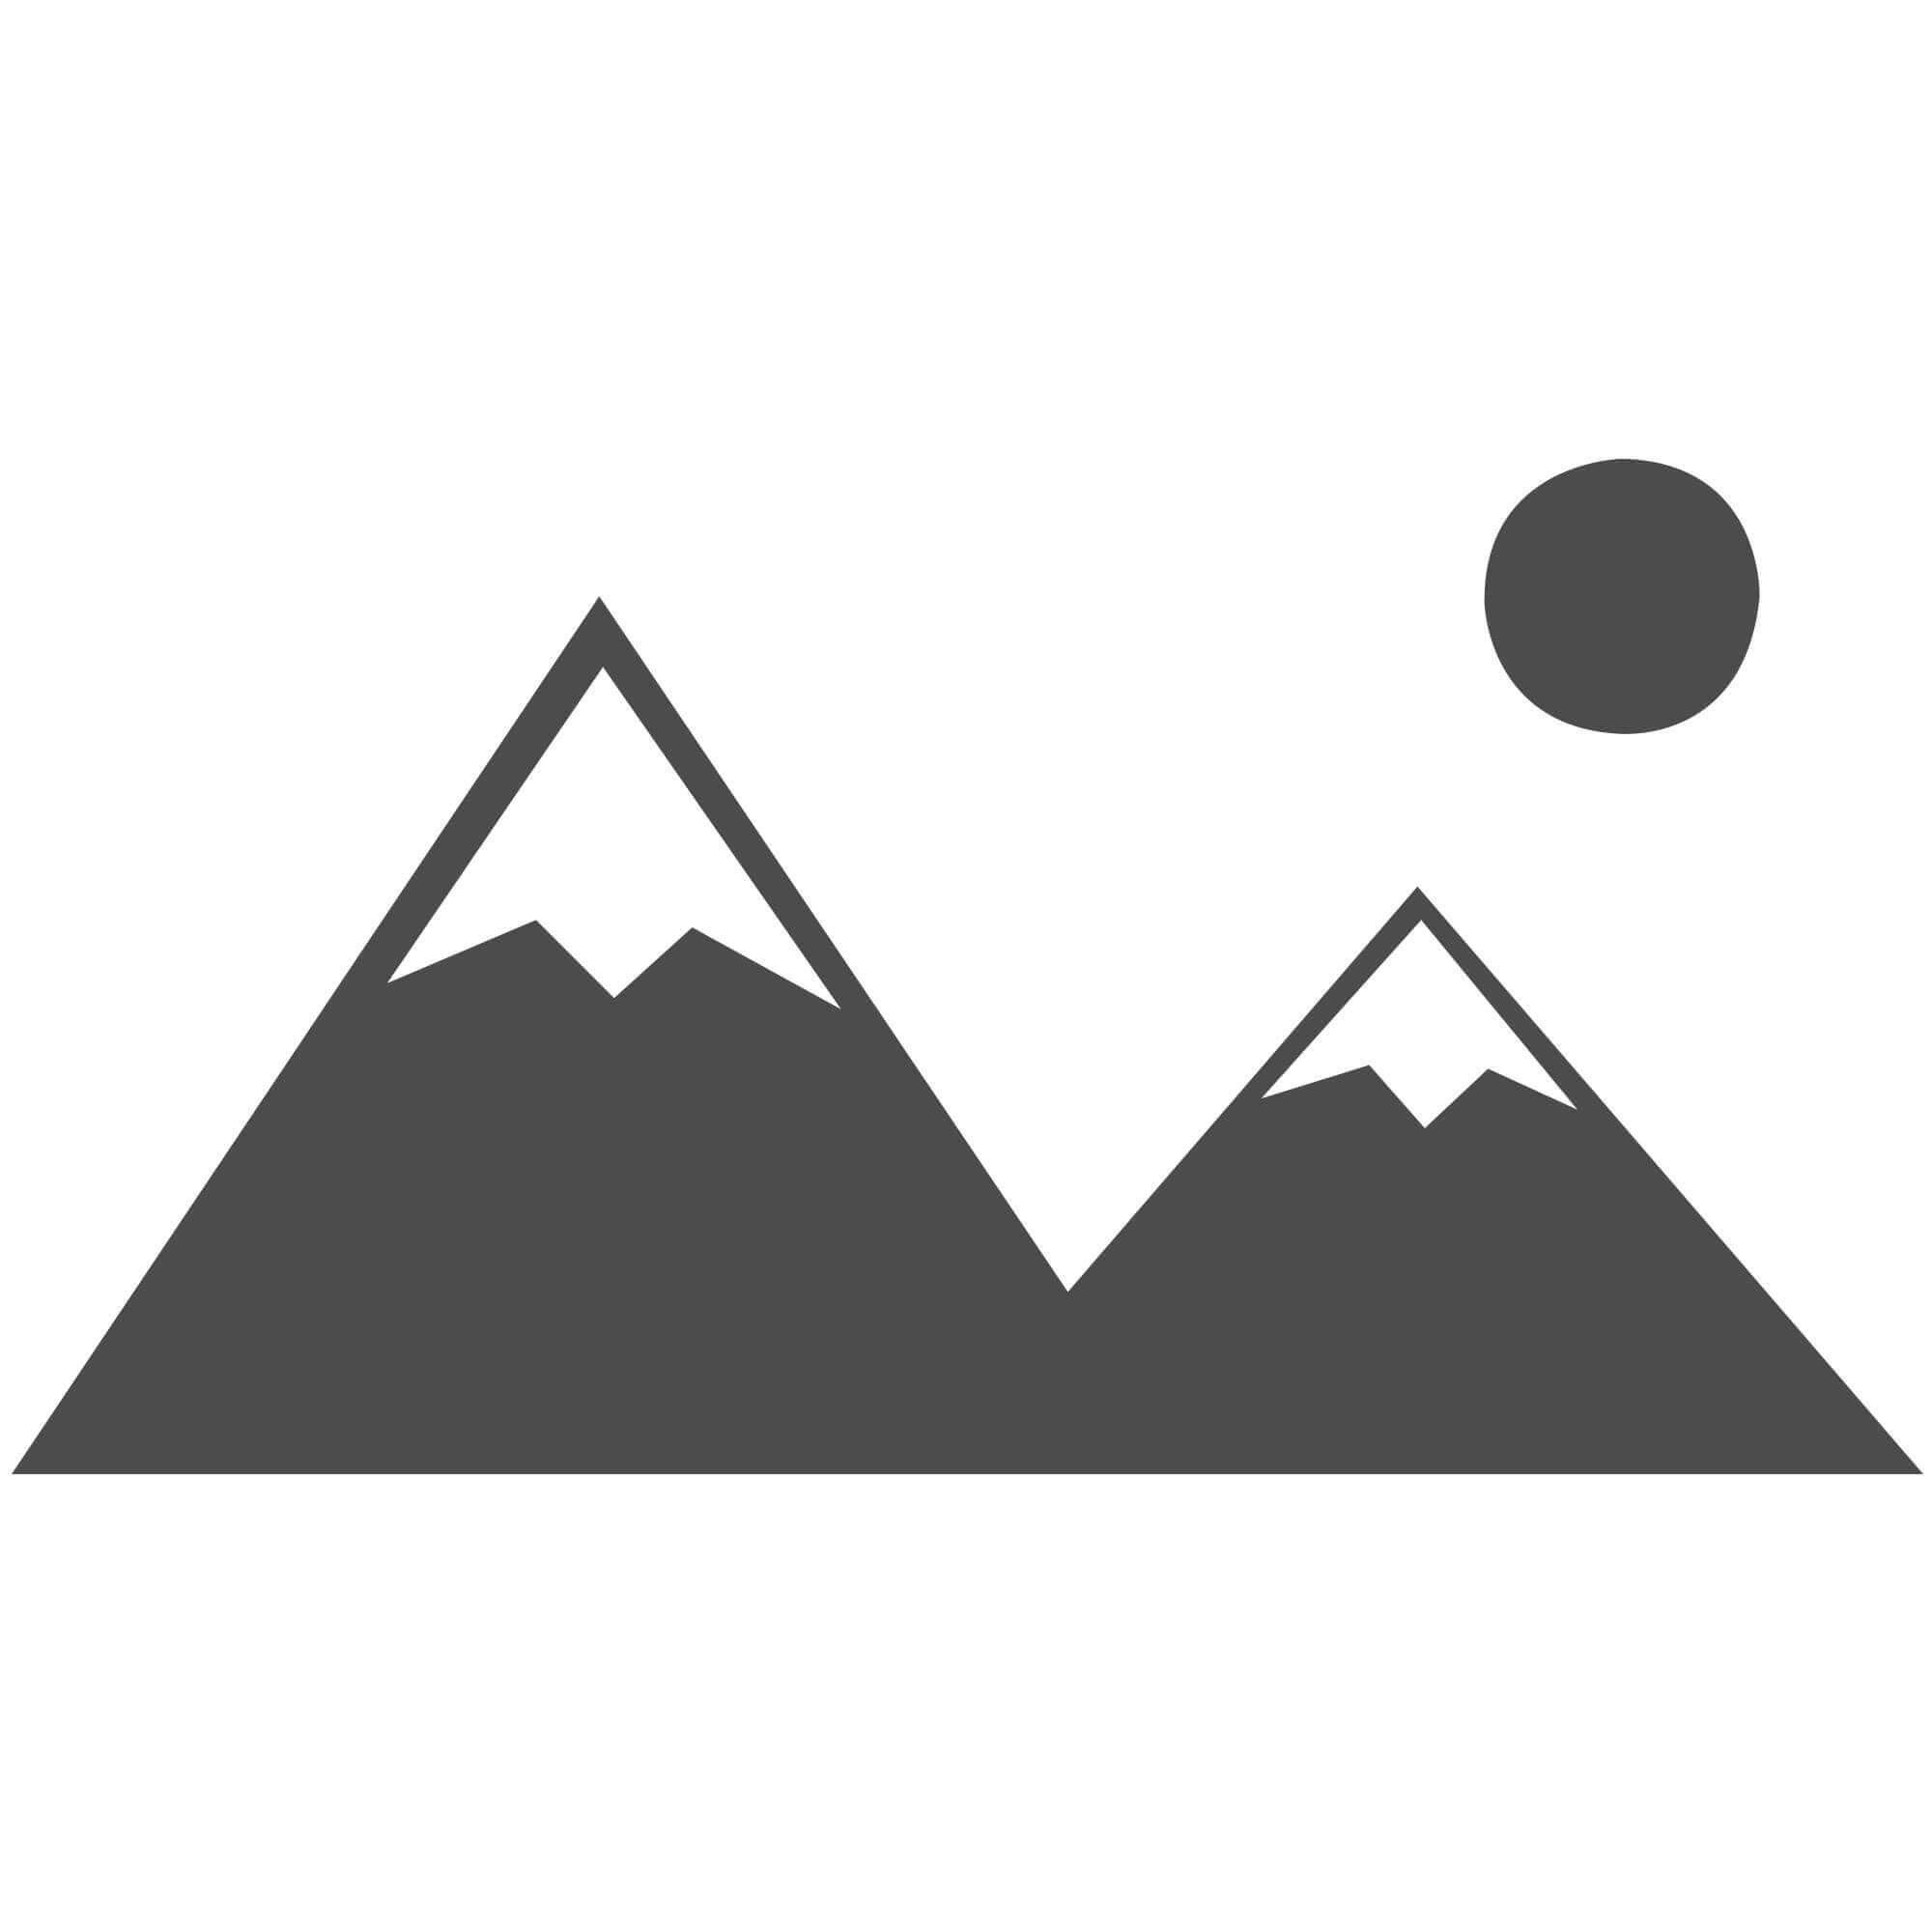 "Ottoman Temple Rug - Cream - Size 120 x 170 cm (4' x 5'7"")"